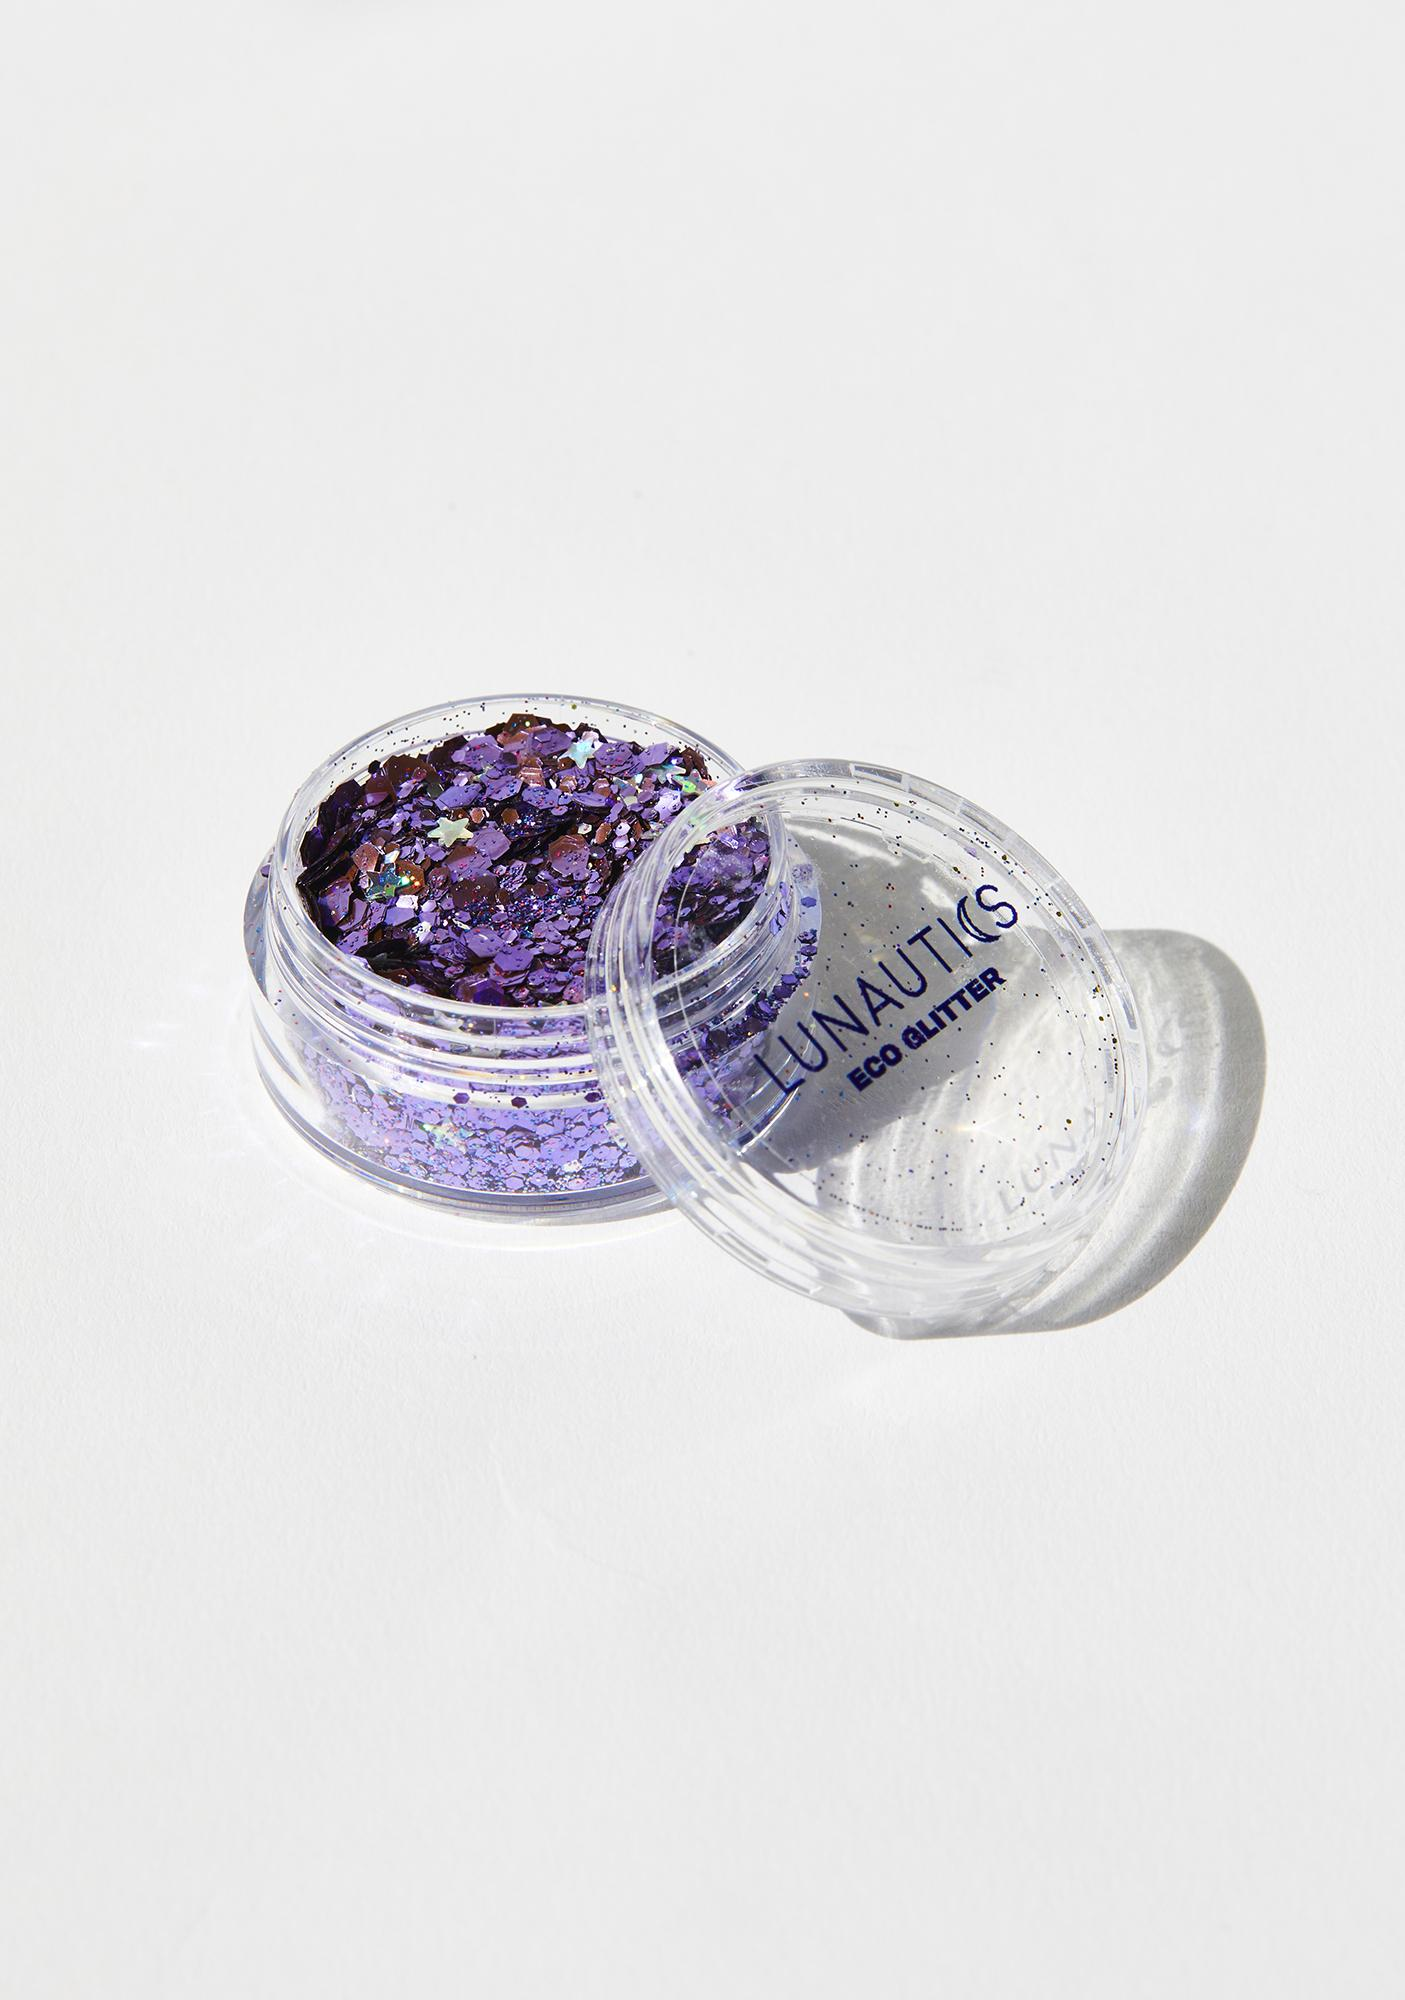 Lunautics Maui Purple Eco Glitter